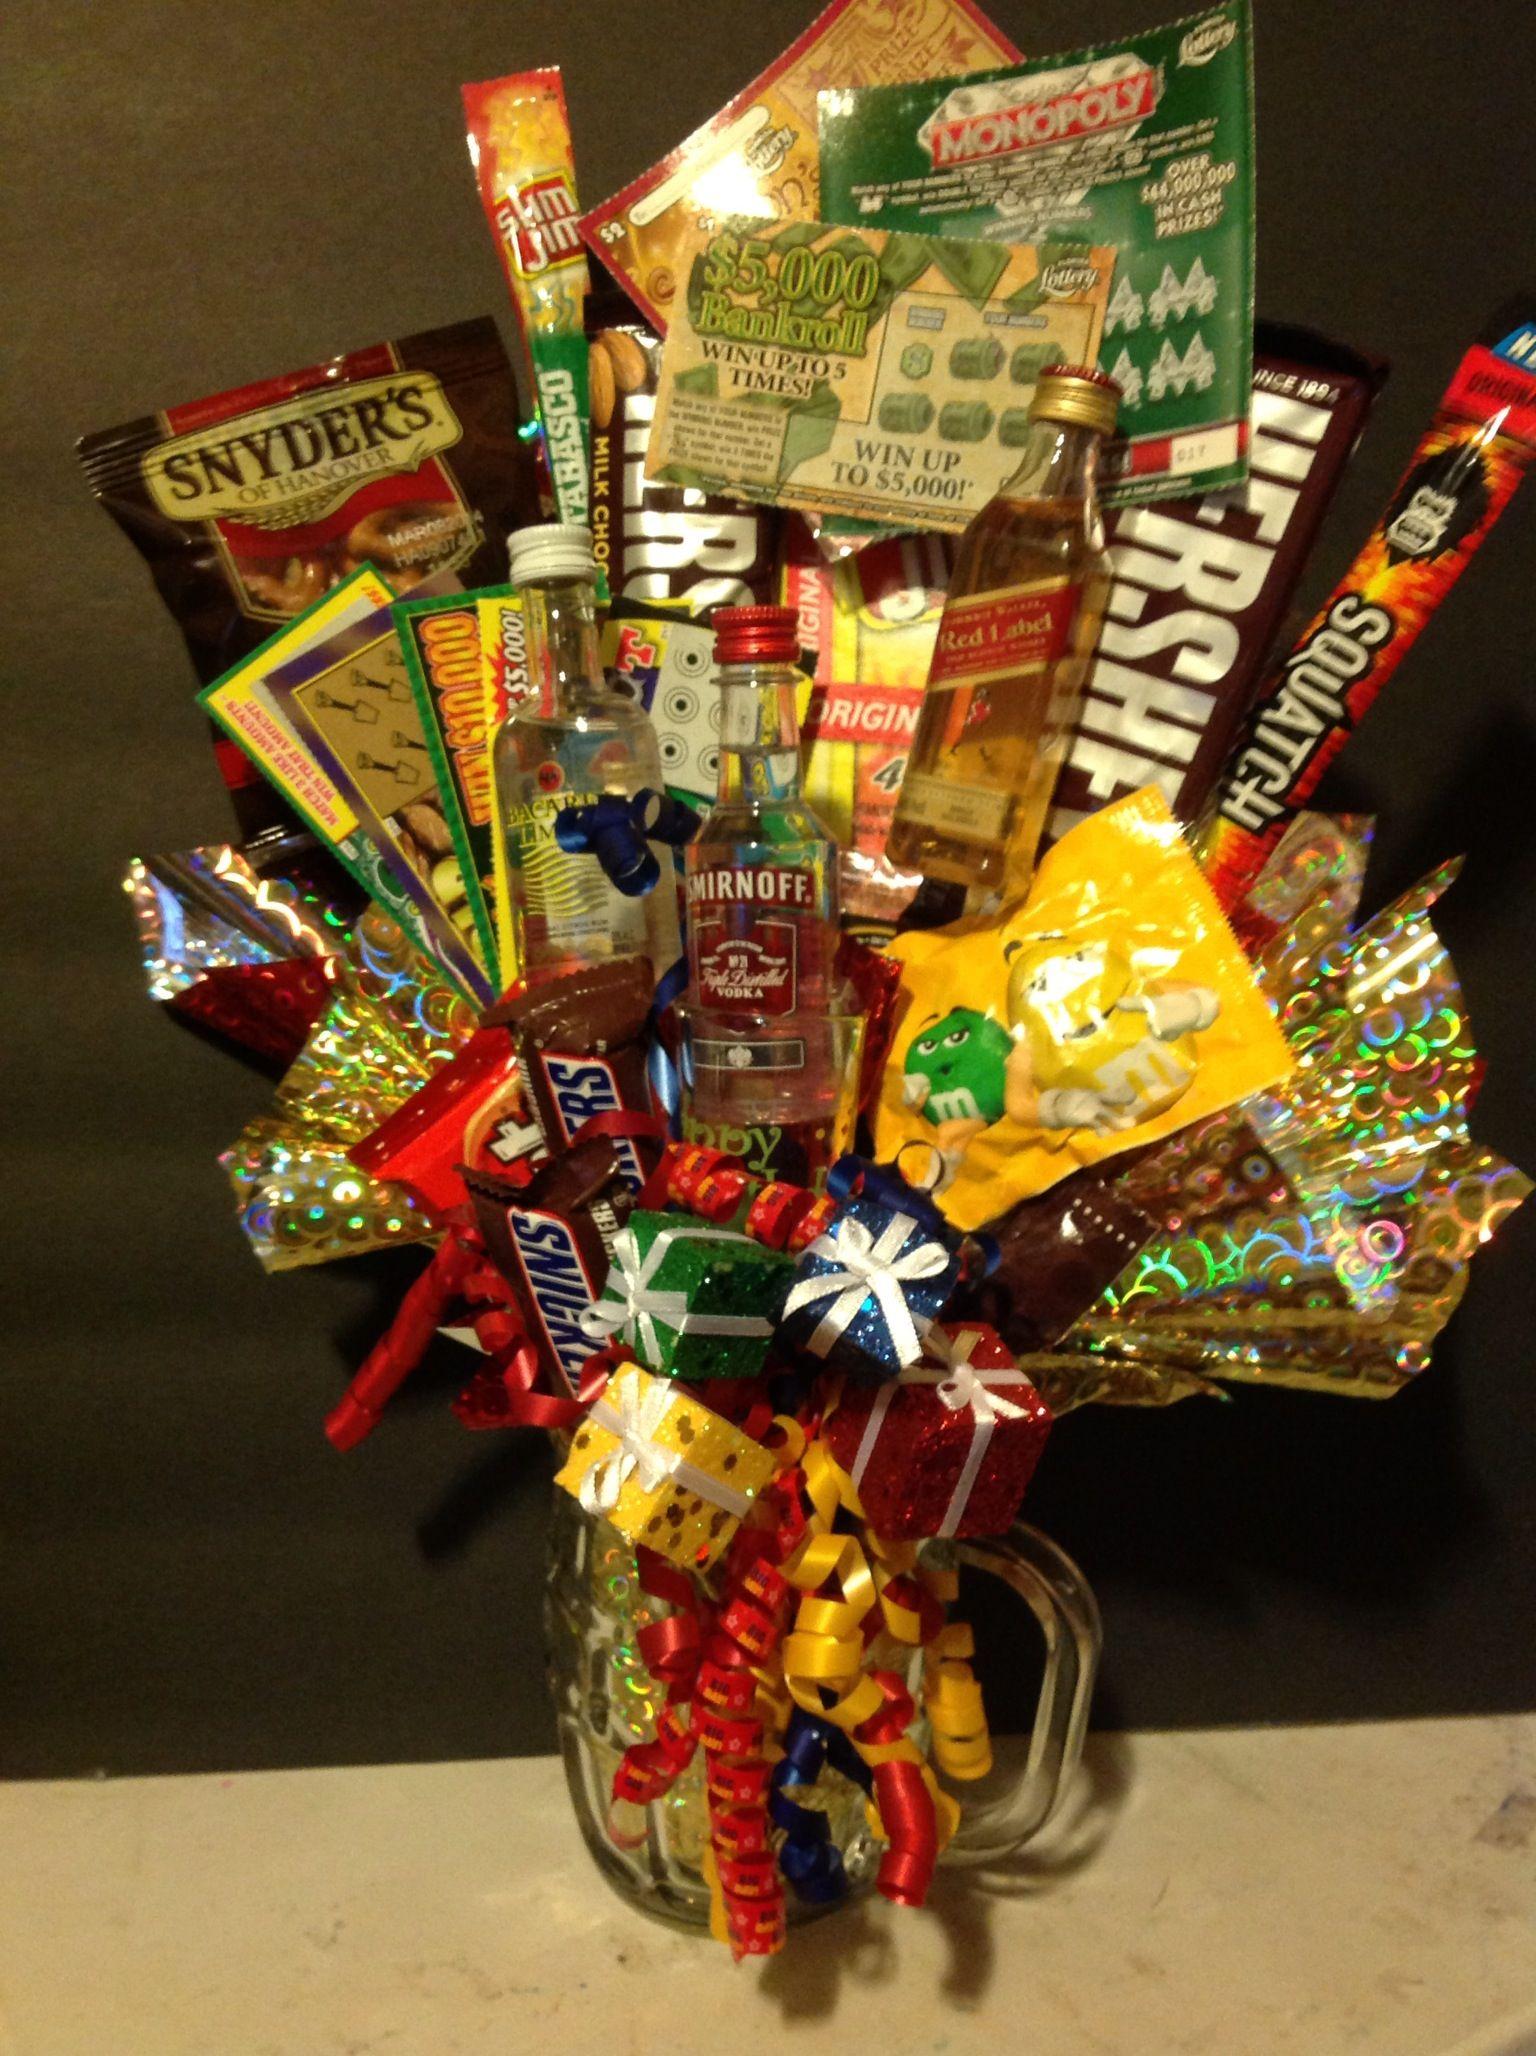 BIRTHDAY TREAT FOR HIM OR HER Diy Birthday Baskets For Him